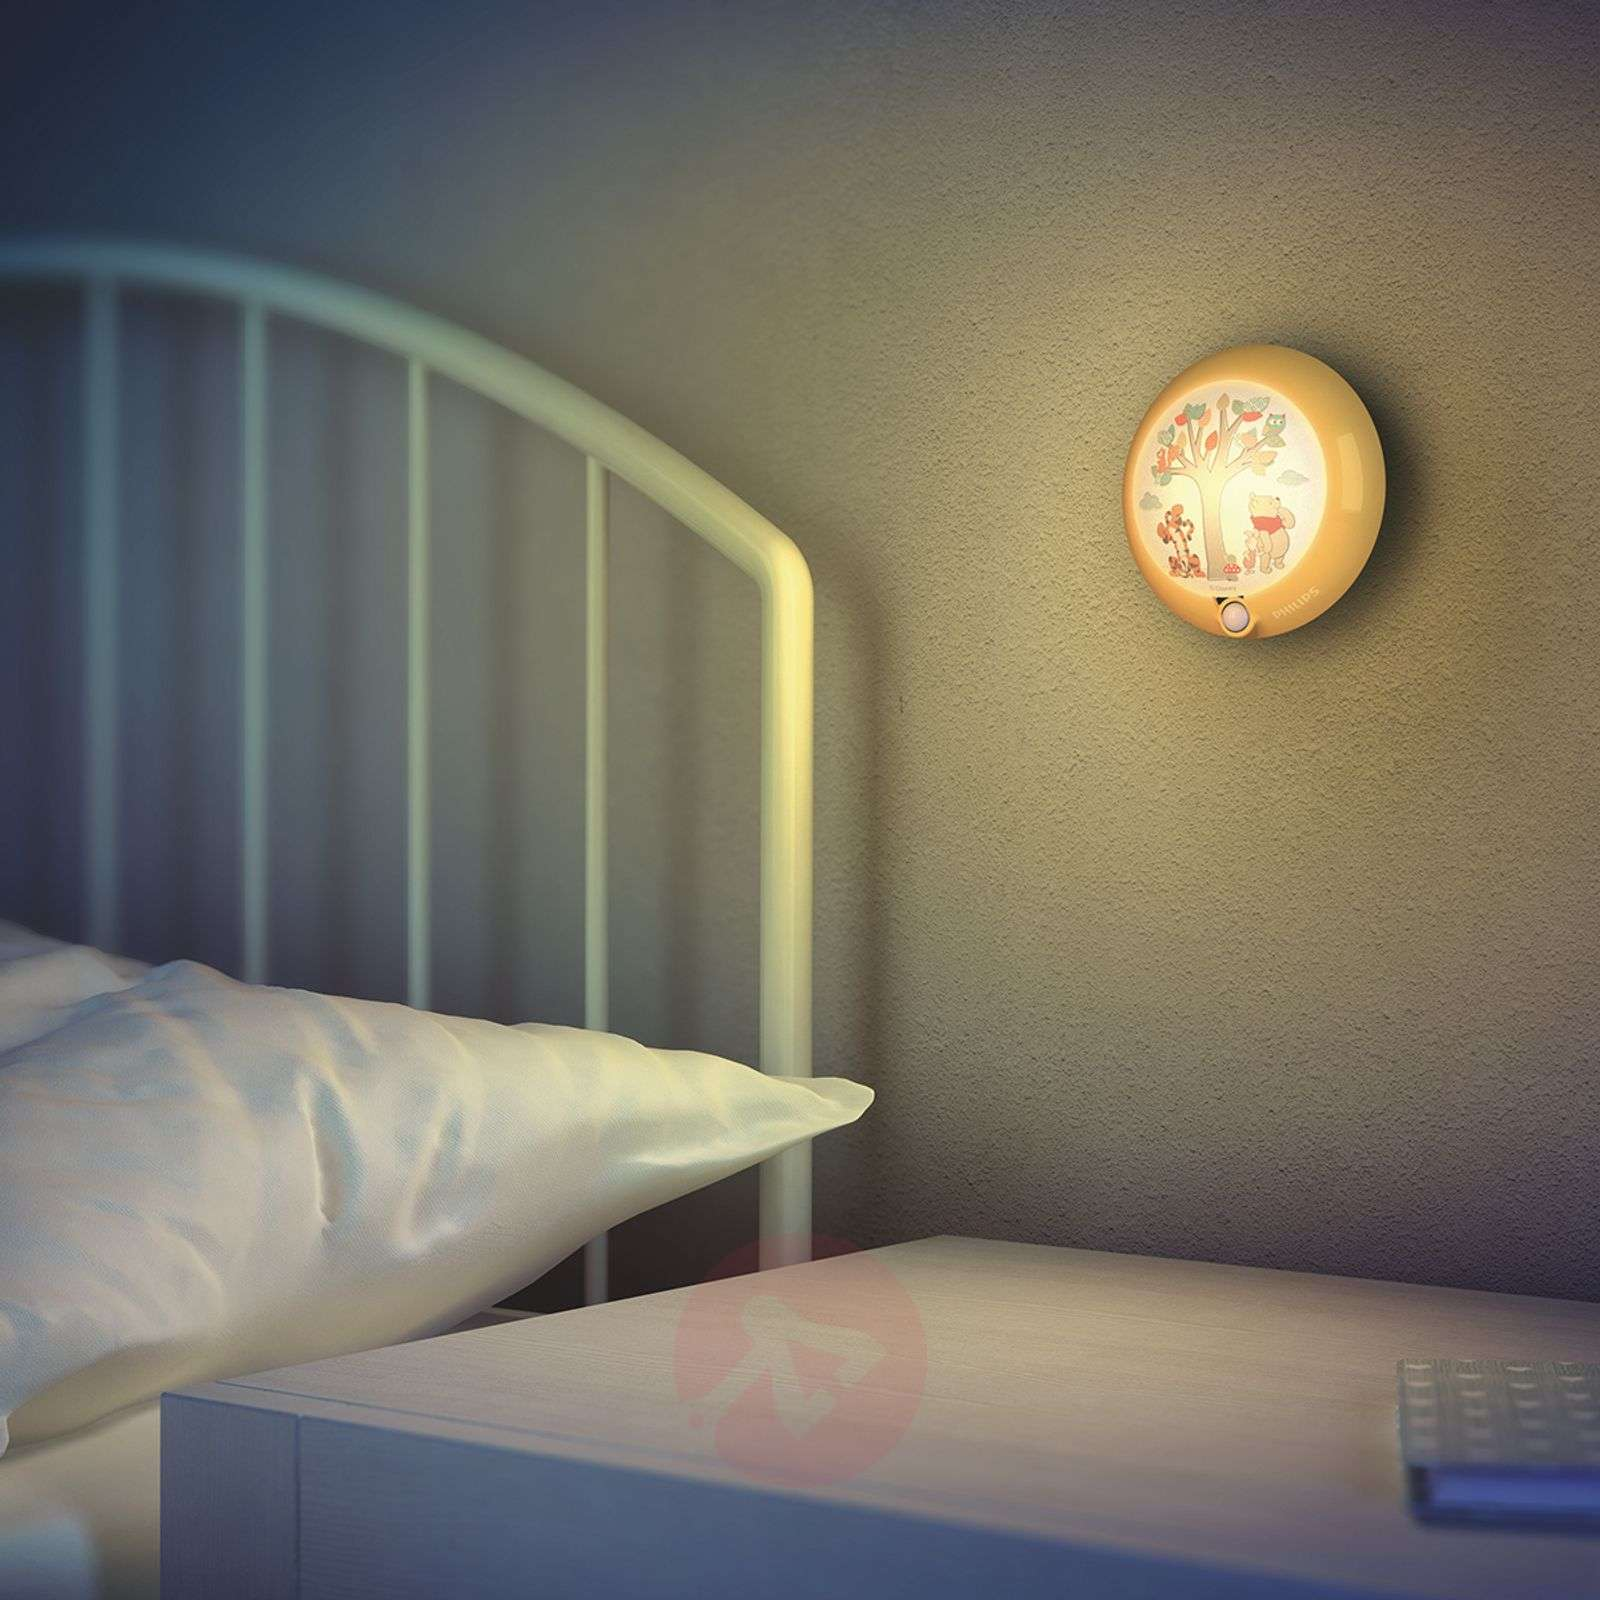 Winnie the Pooh LED night light, motion detector-7531543-01